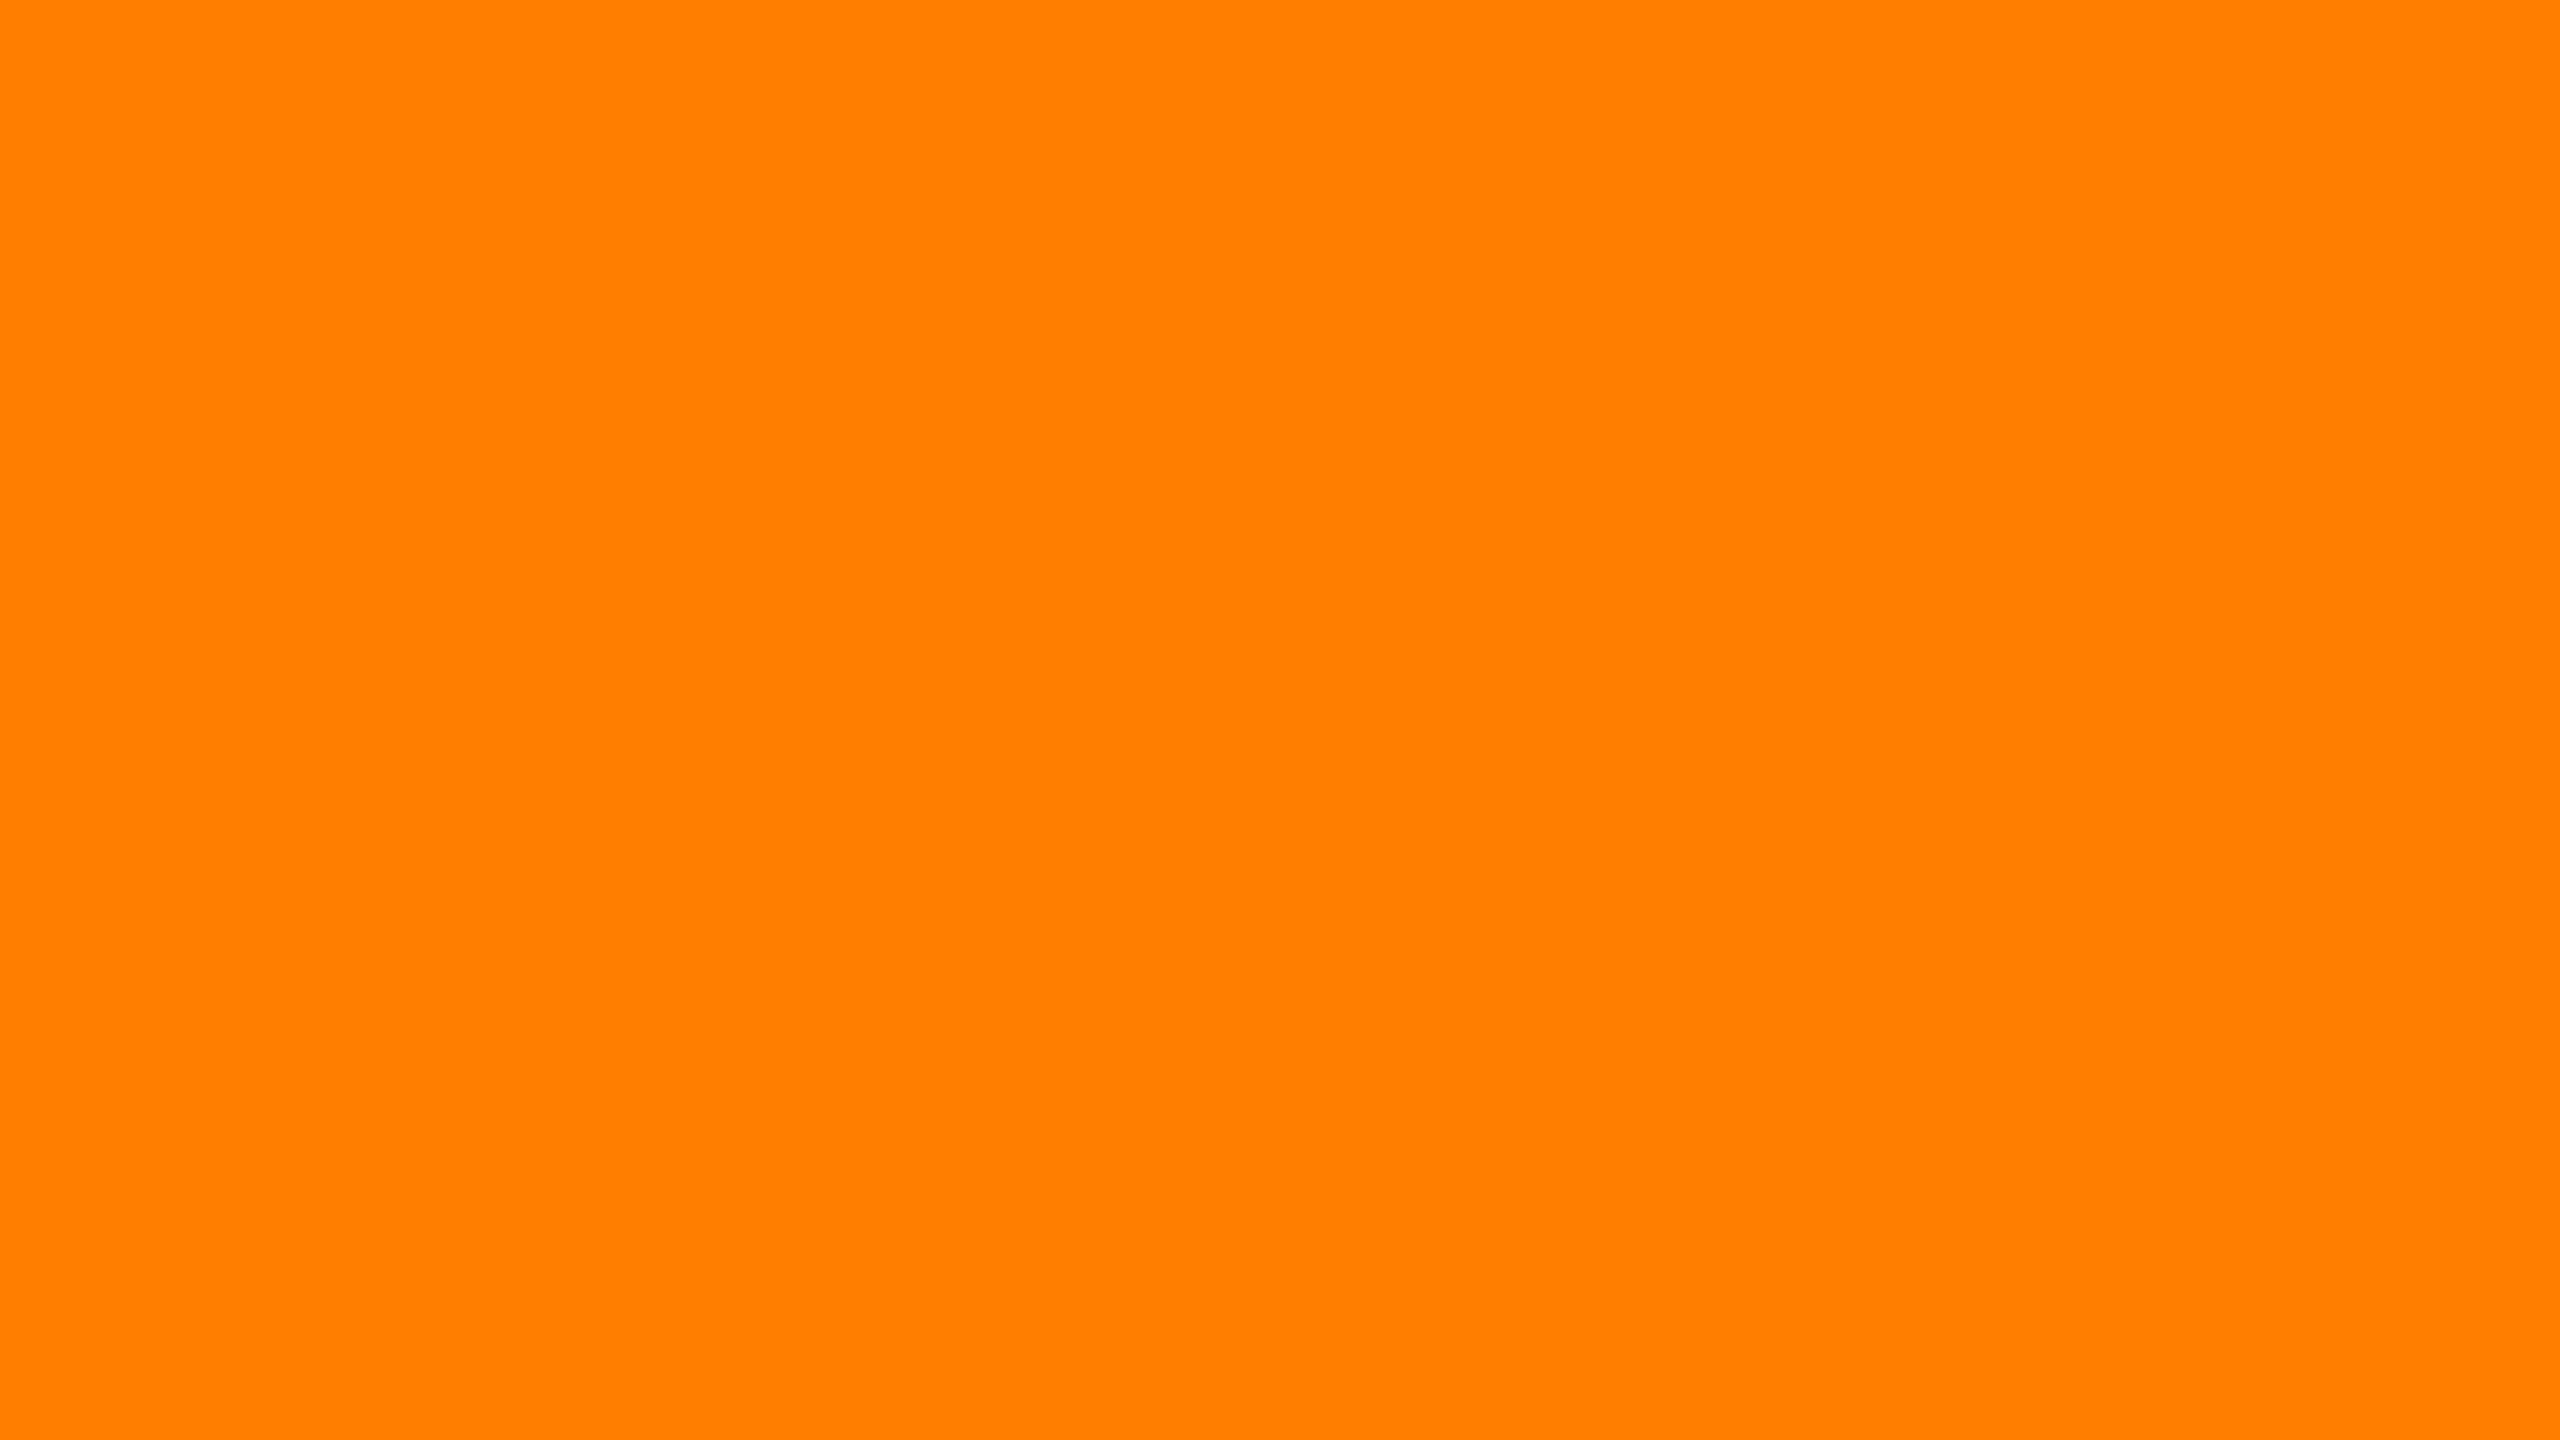 background color solid orange amber images 2560x1440 2560x1440